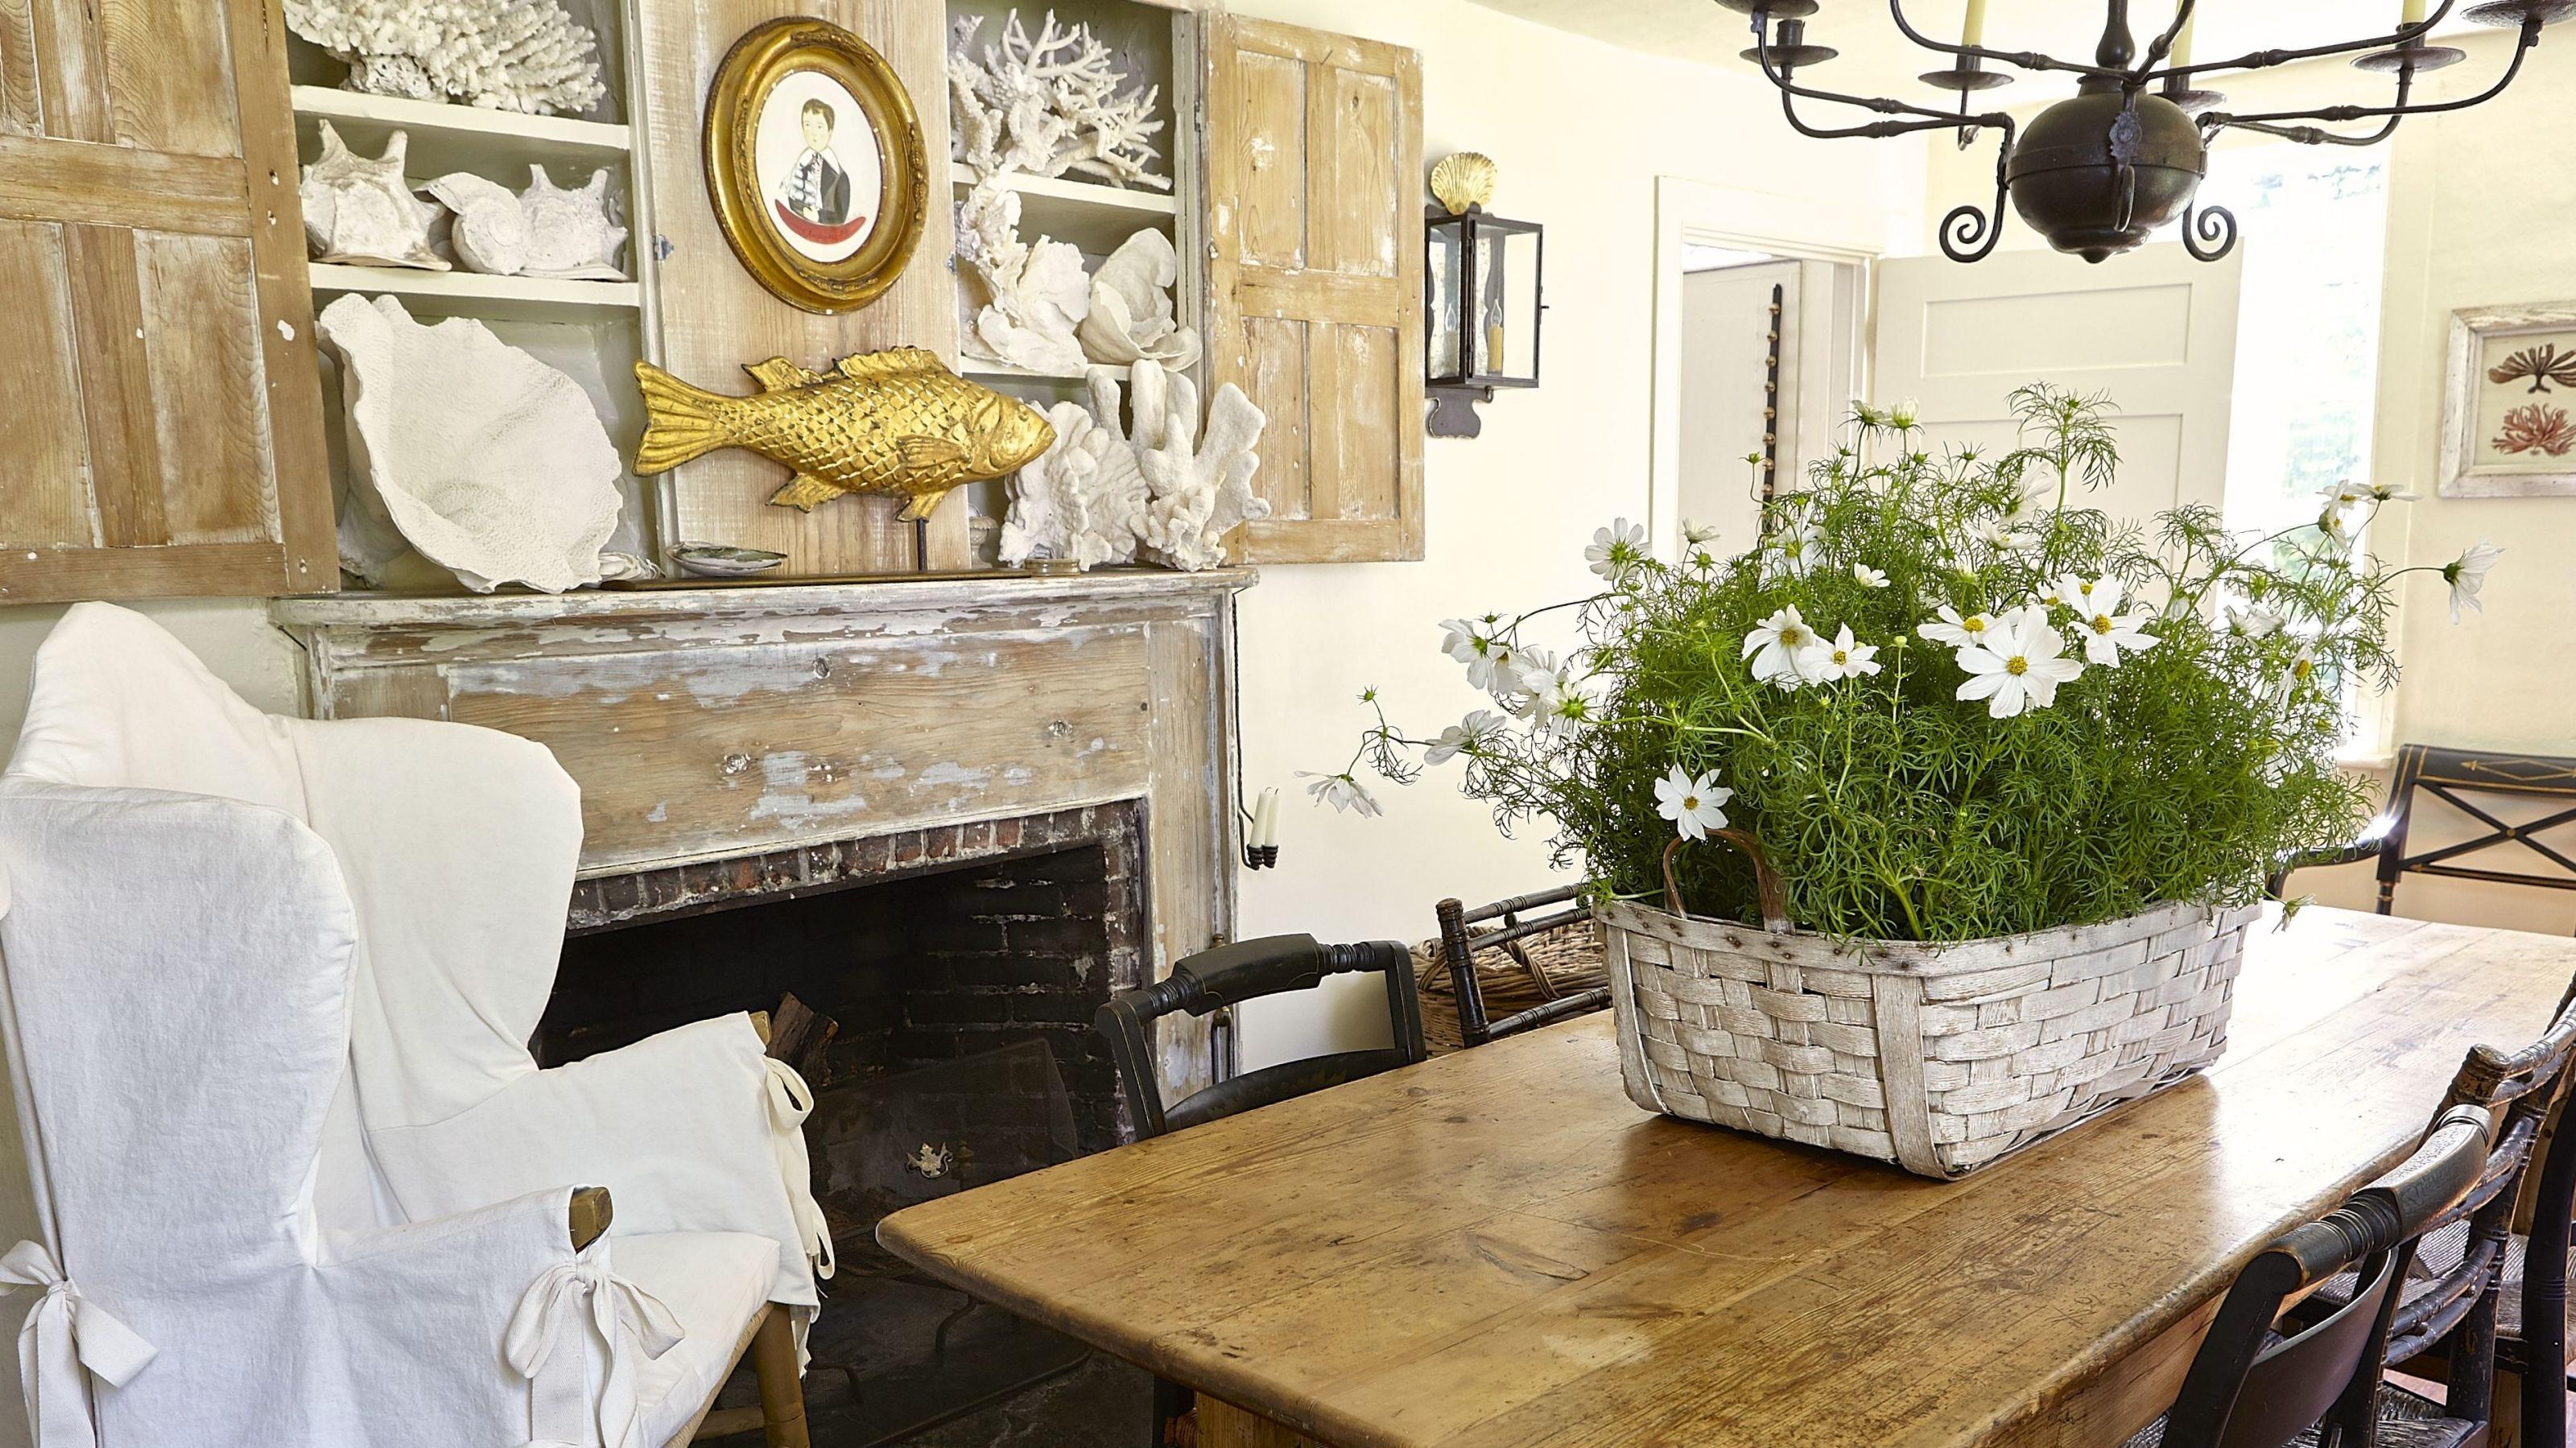 Room, Interior design, Table, Furniture, Interior design, Floor, Ceiling, Picture frame, Flowerpot, Home,